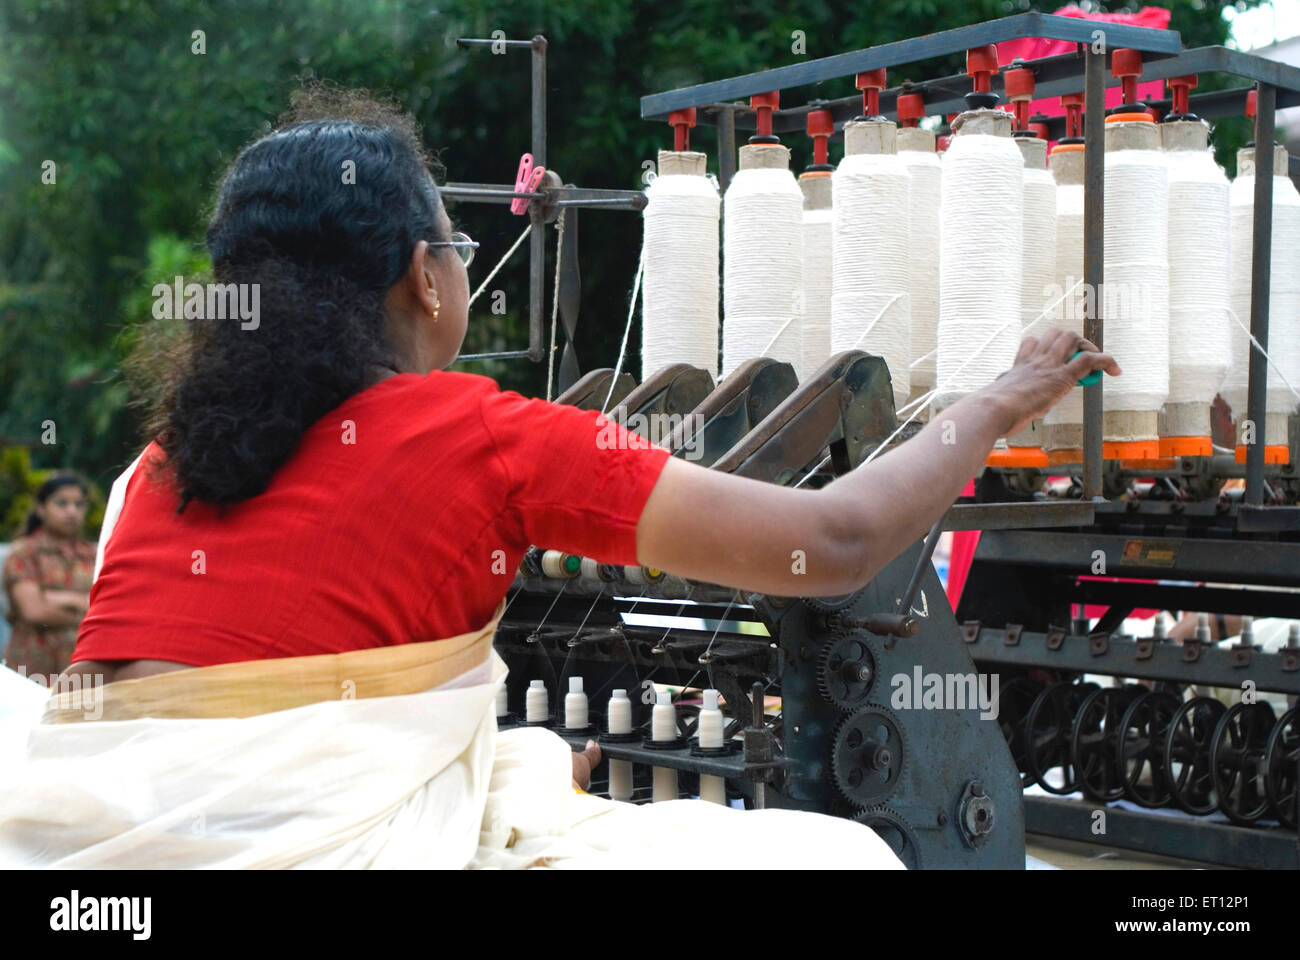 Lady spinning loom making cotton threads ; Trivandrum ; Kerala ; India - Stock Image